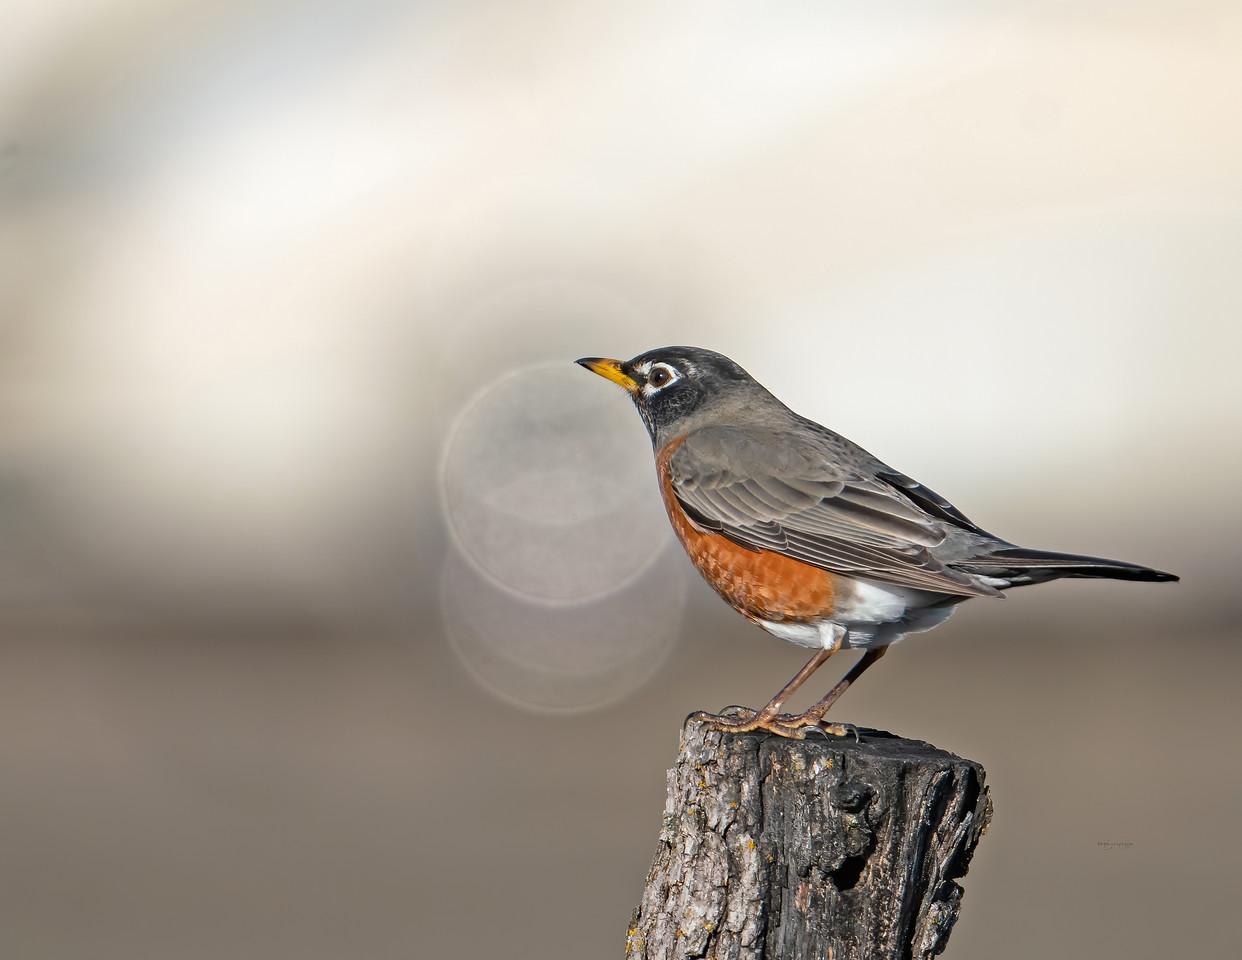 IMAGE: https://photos.smugmug.com/Beautyinthetreesandintheair/Birds/i-74bVkDH/0/2bc5a968/X2/American%20robin_R3_1-1-21-21-X2.jpg